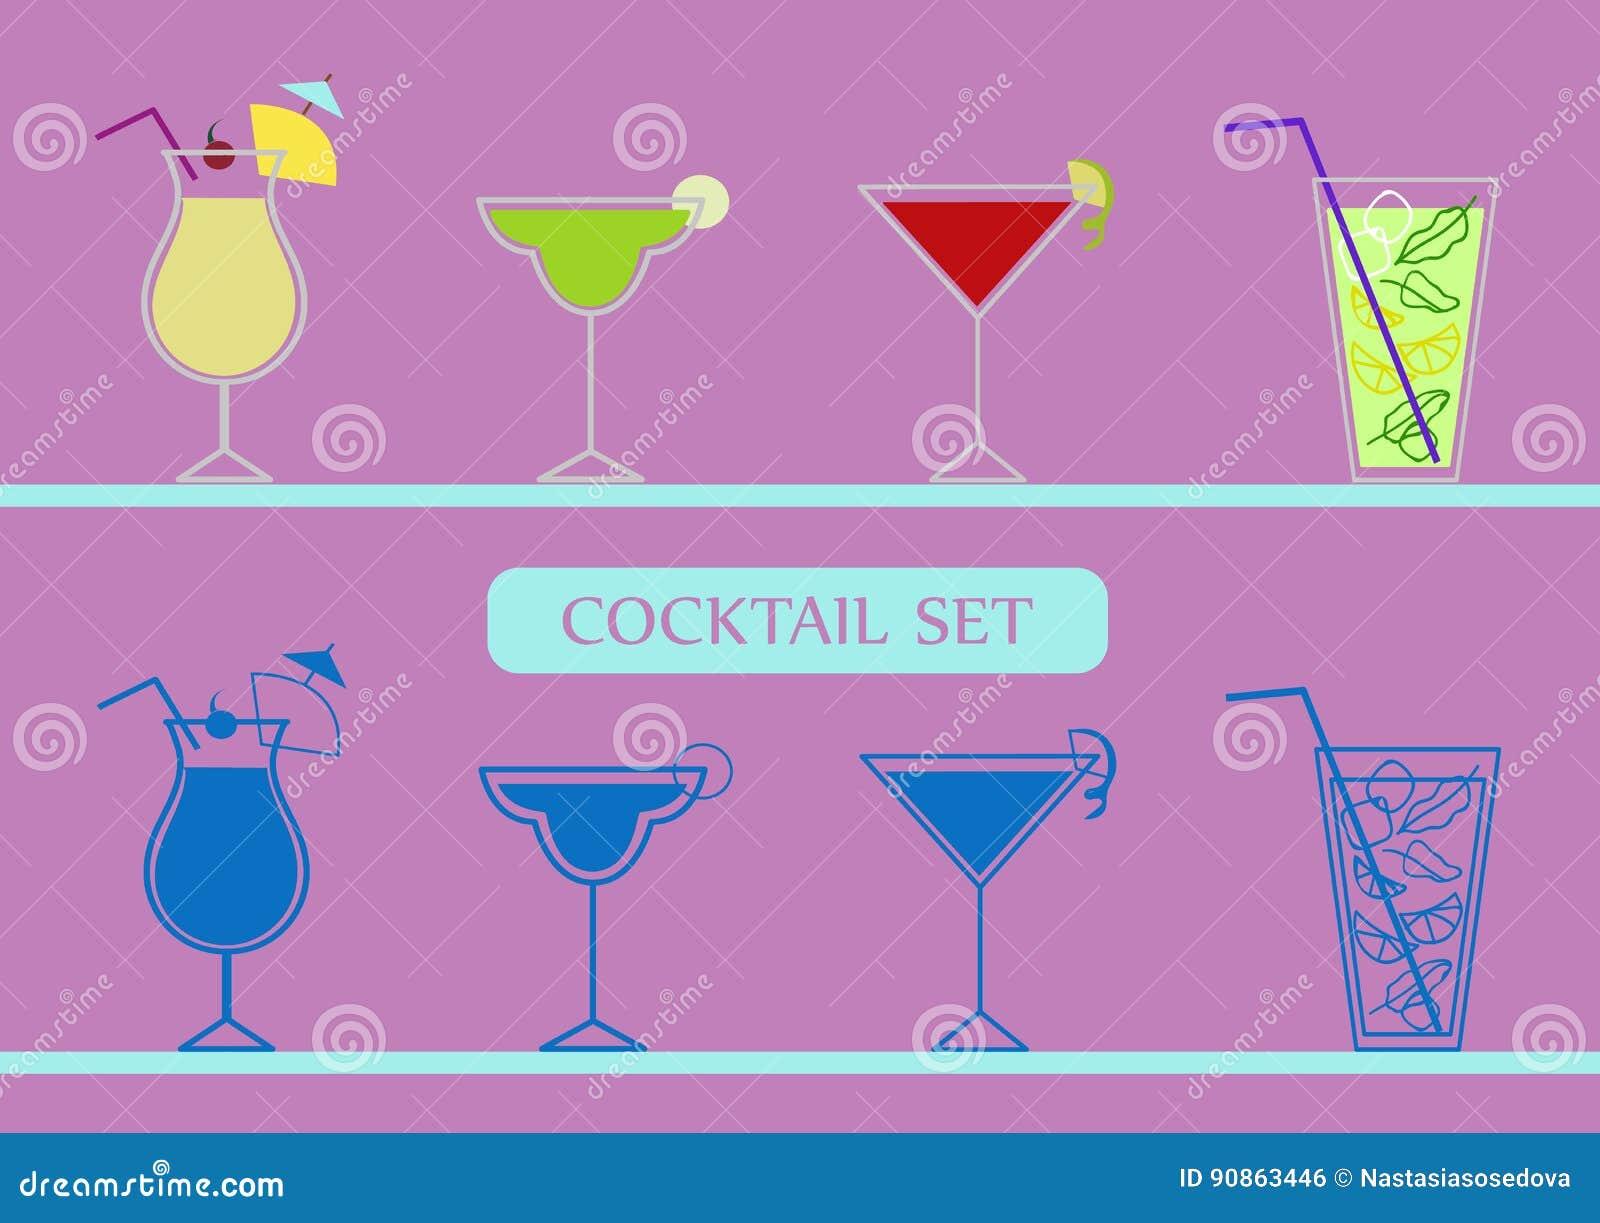 Icons set with pinacolada, margarita, cosmopolitan and mojito cocktails.